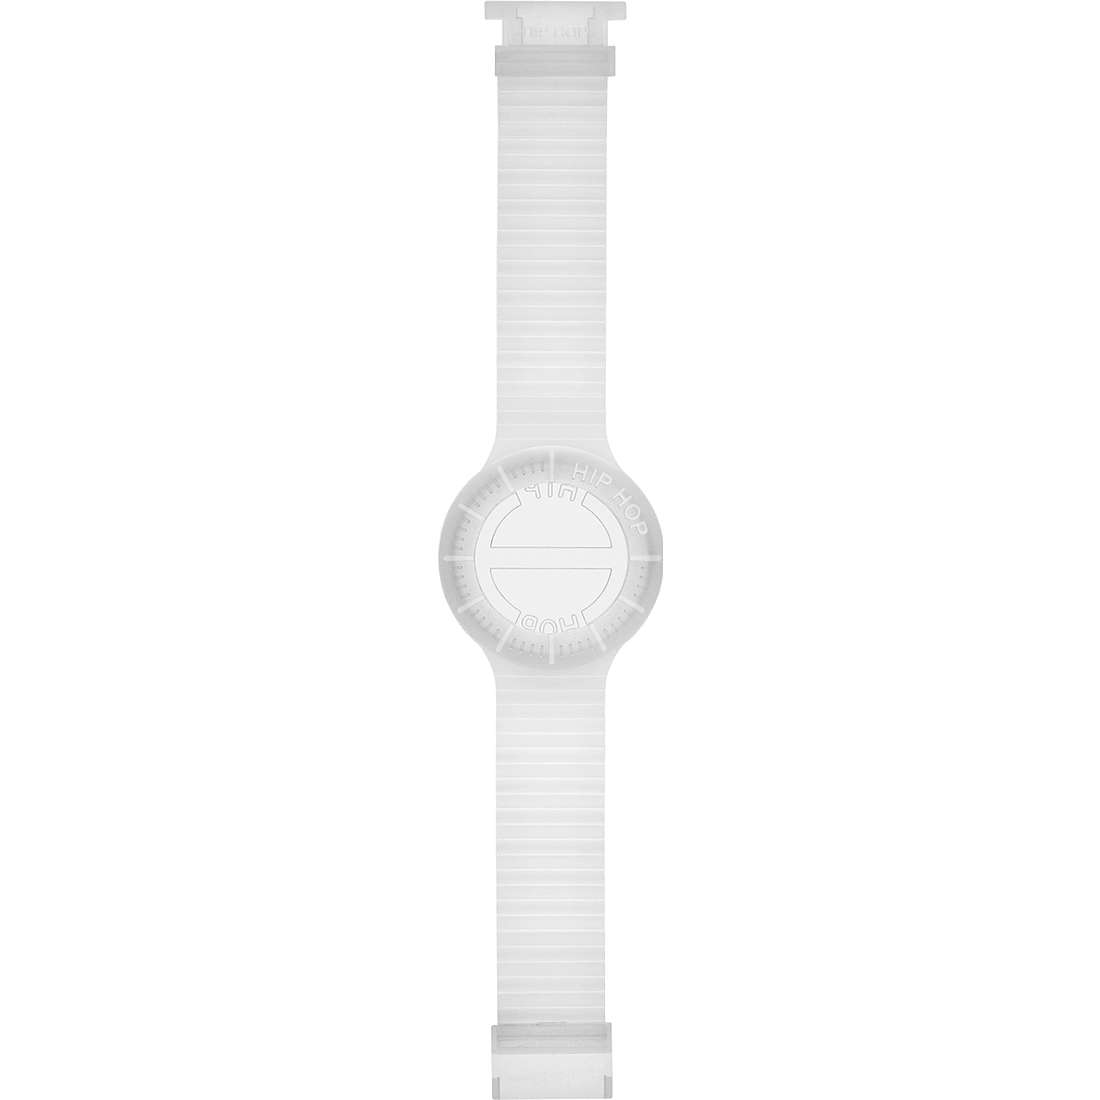 watch watch strap unisex Hip Hop Multifunzione HBU0183